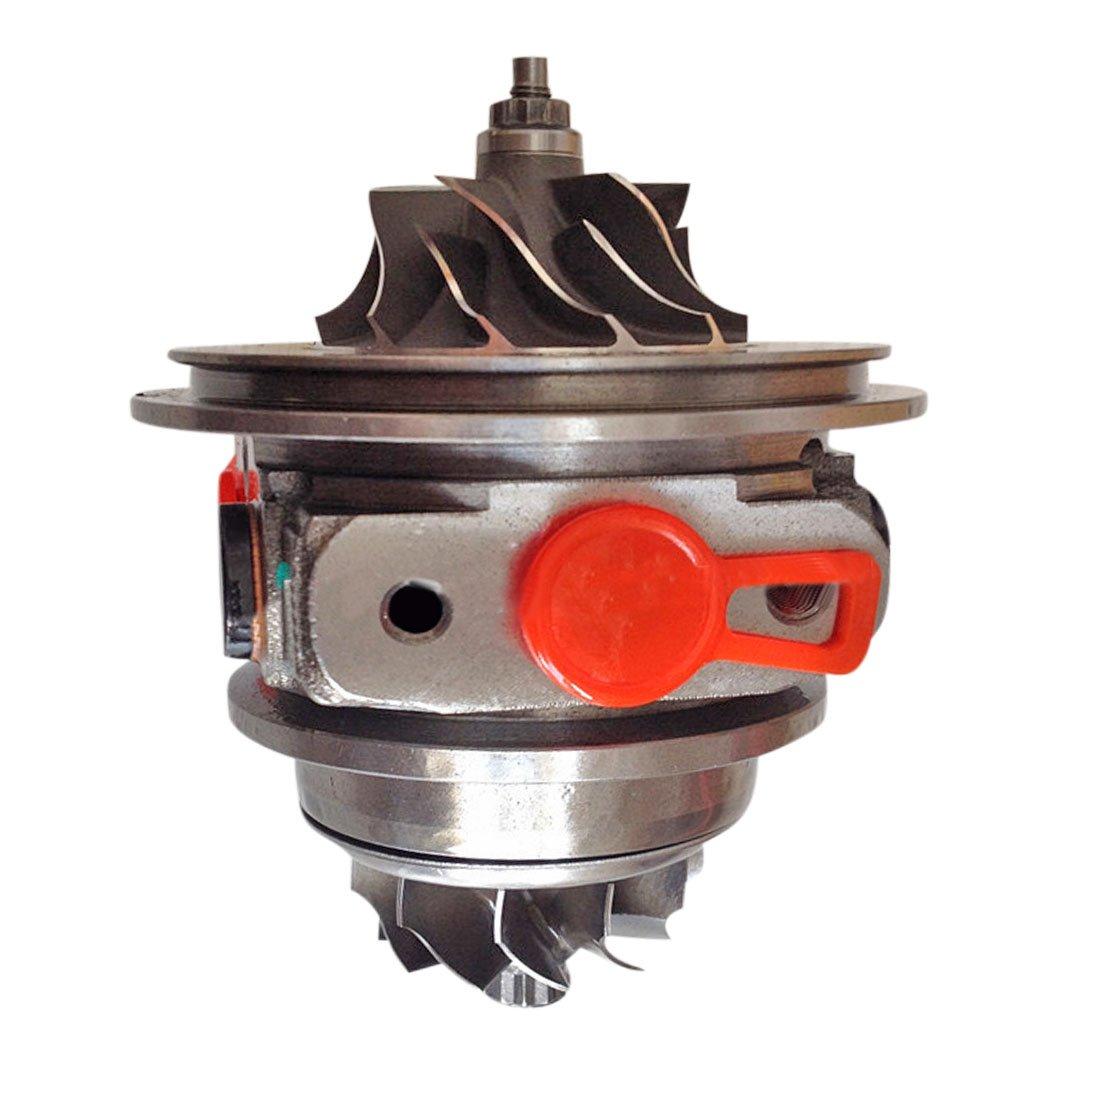 TF035 49135 - 04300 49135 - 04302 - 28200 - 42650 Turbo CHRA para Hyundai Starex H1 D4BH comercial 4D56 A-1 2,5 TD 99hp: Amazon.es: Coche y moto